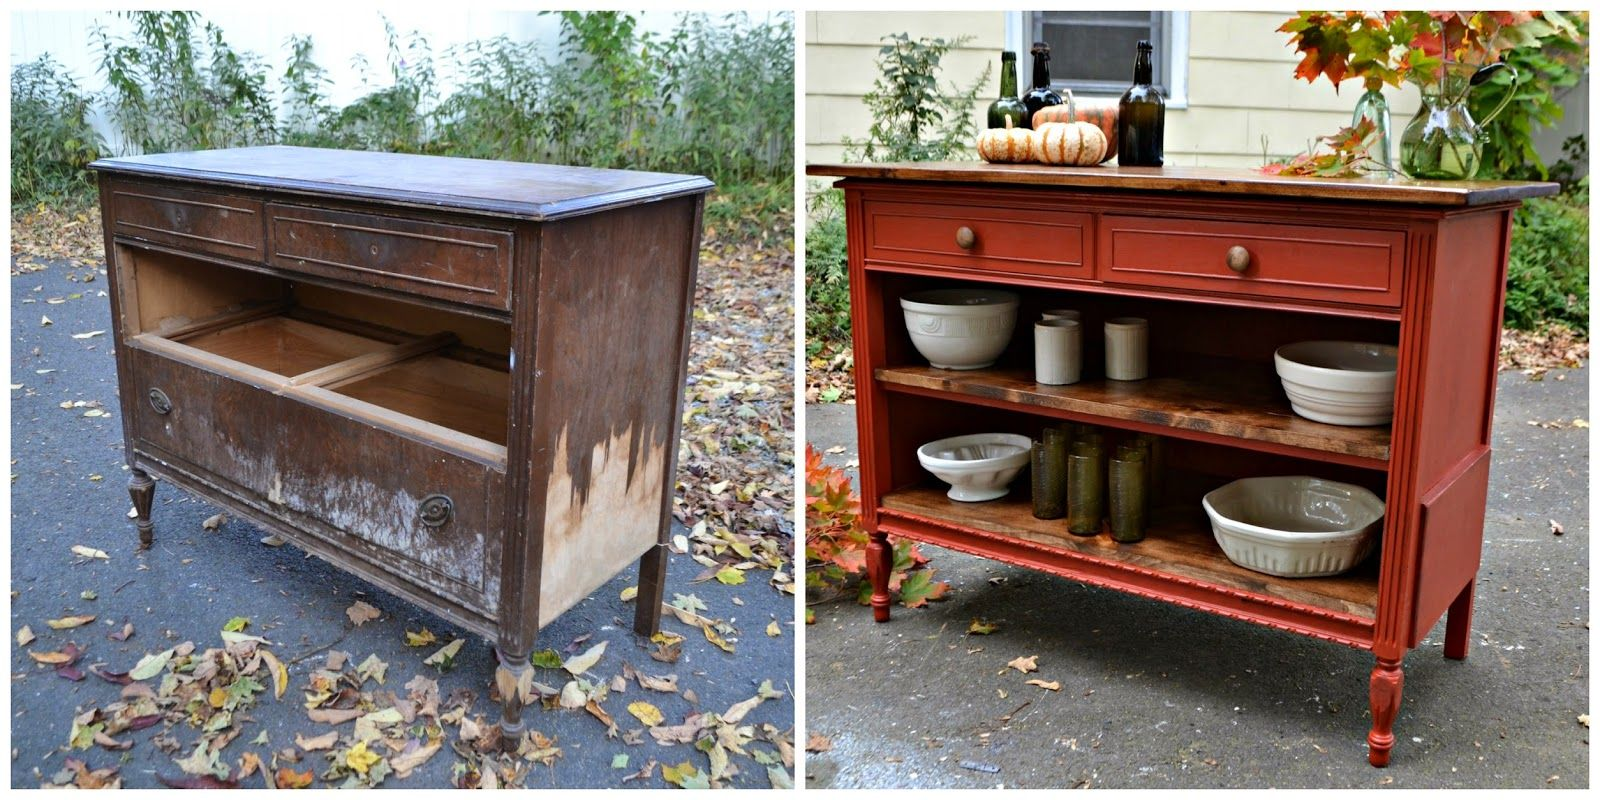 Repurposed Antique Dresser As A Kitchen Island With A: Old Dresser ...kitchen Island